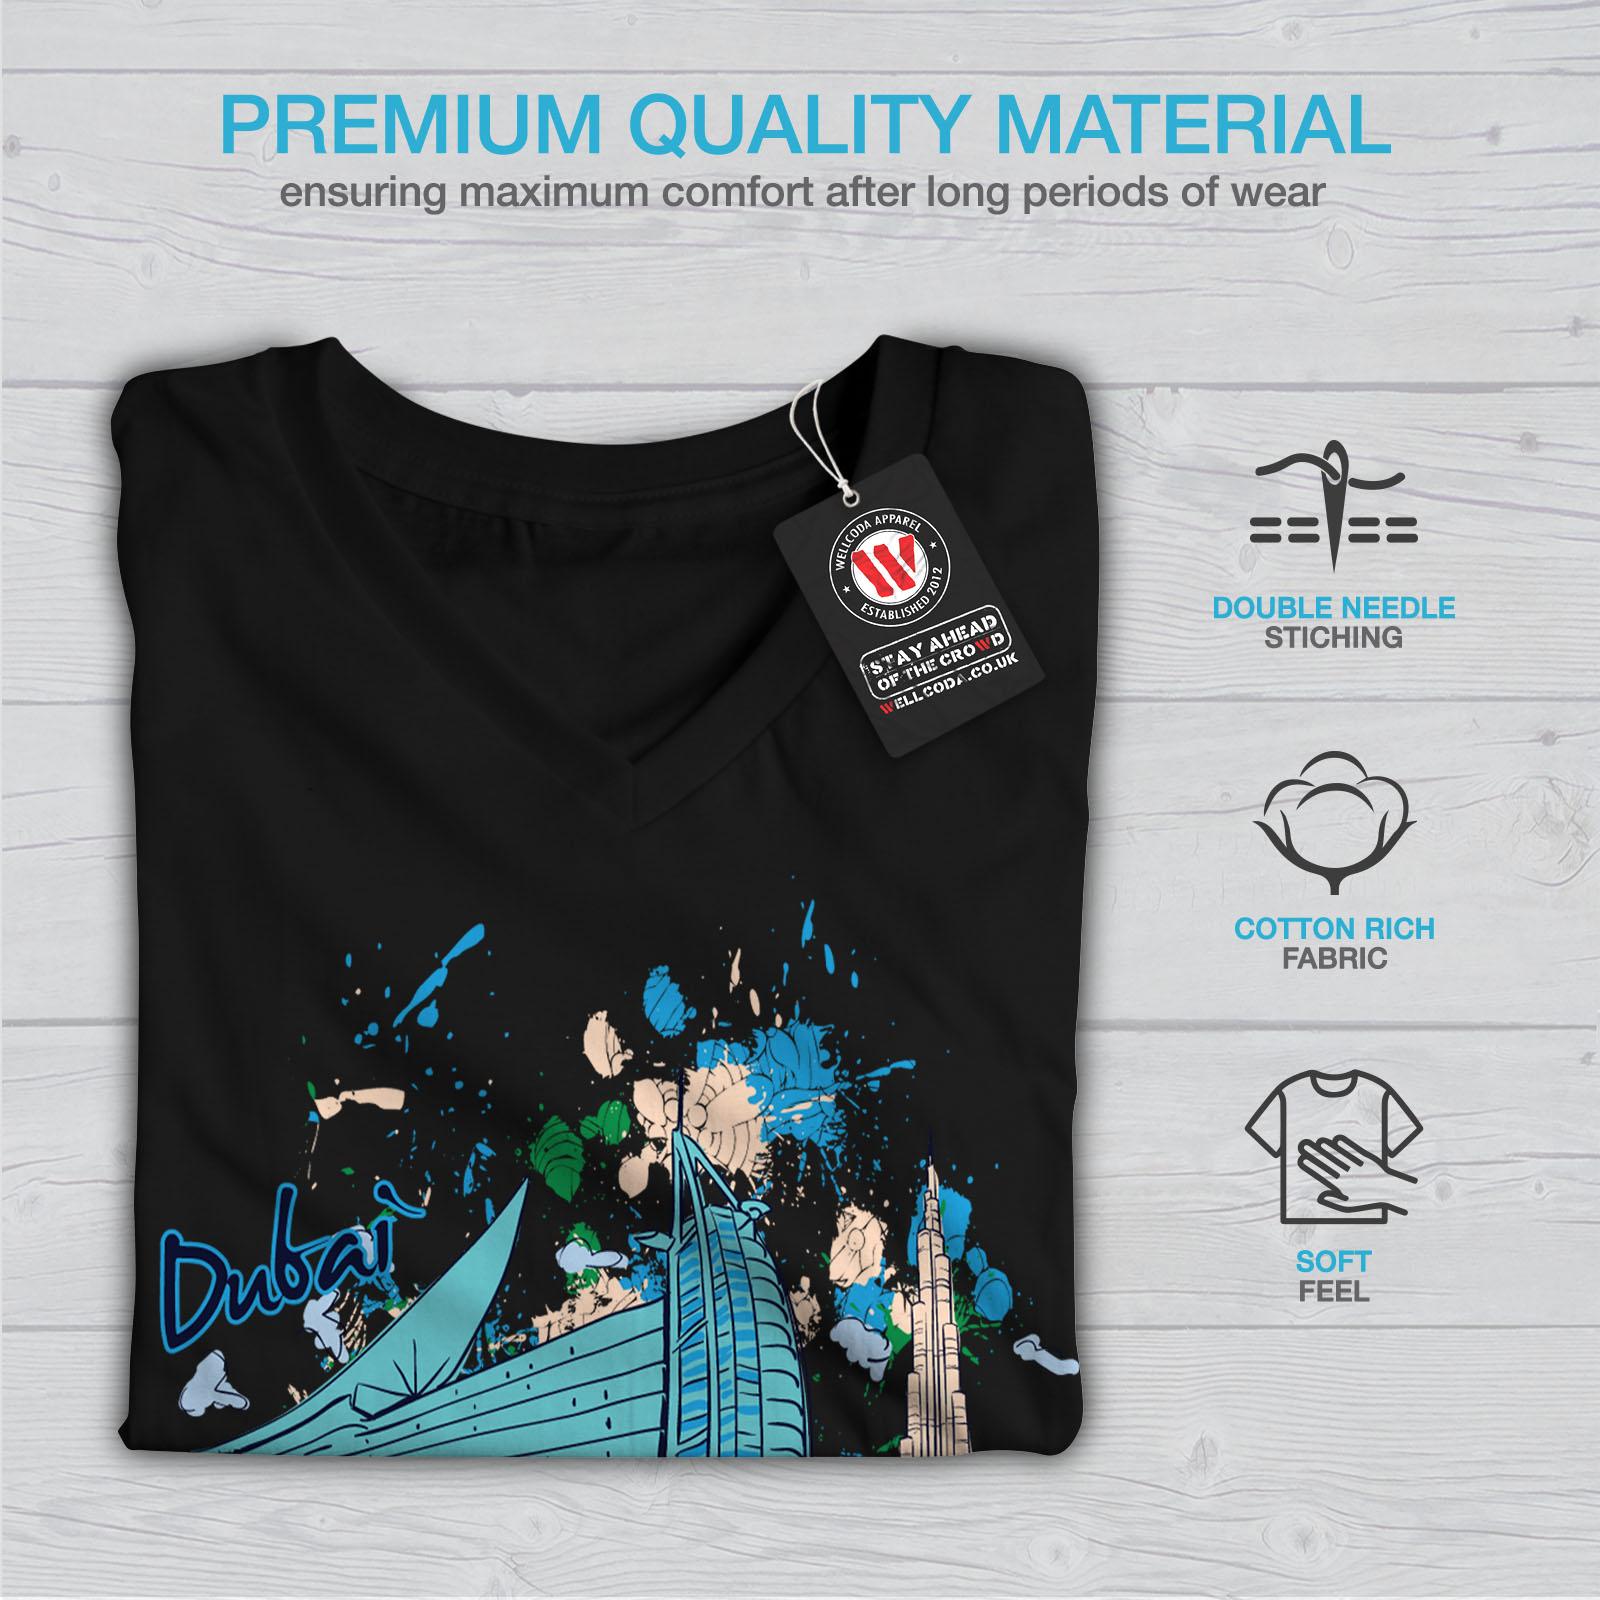 Wellcoda-Dubai-Womens-V-Neck-T-shirt-United-Arab-Graphic-Design-Tee thumbnail 5